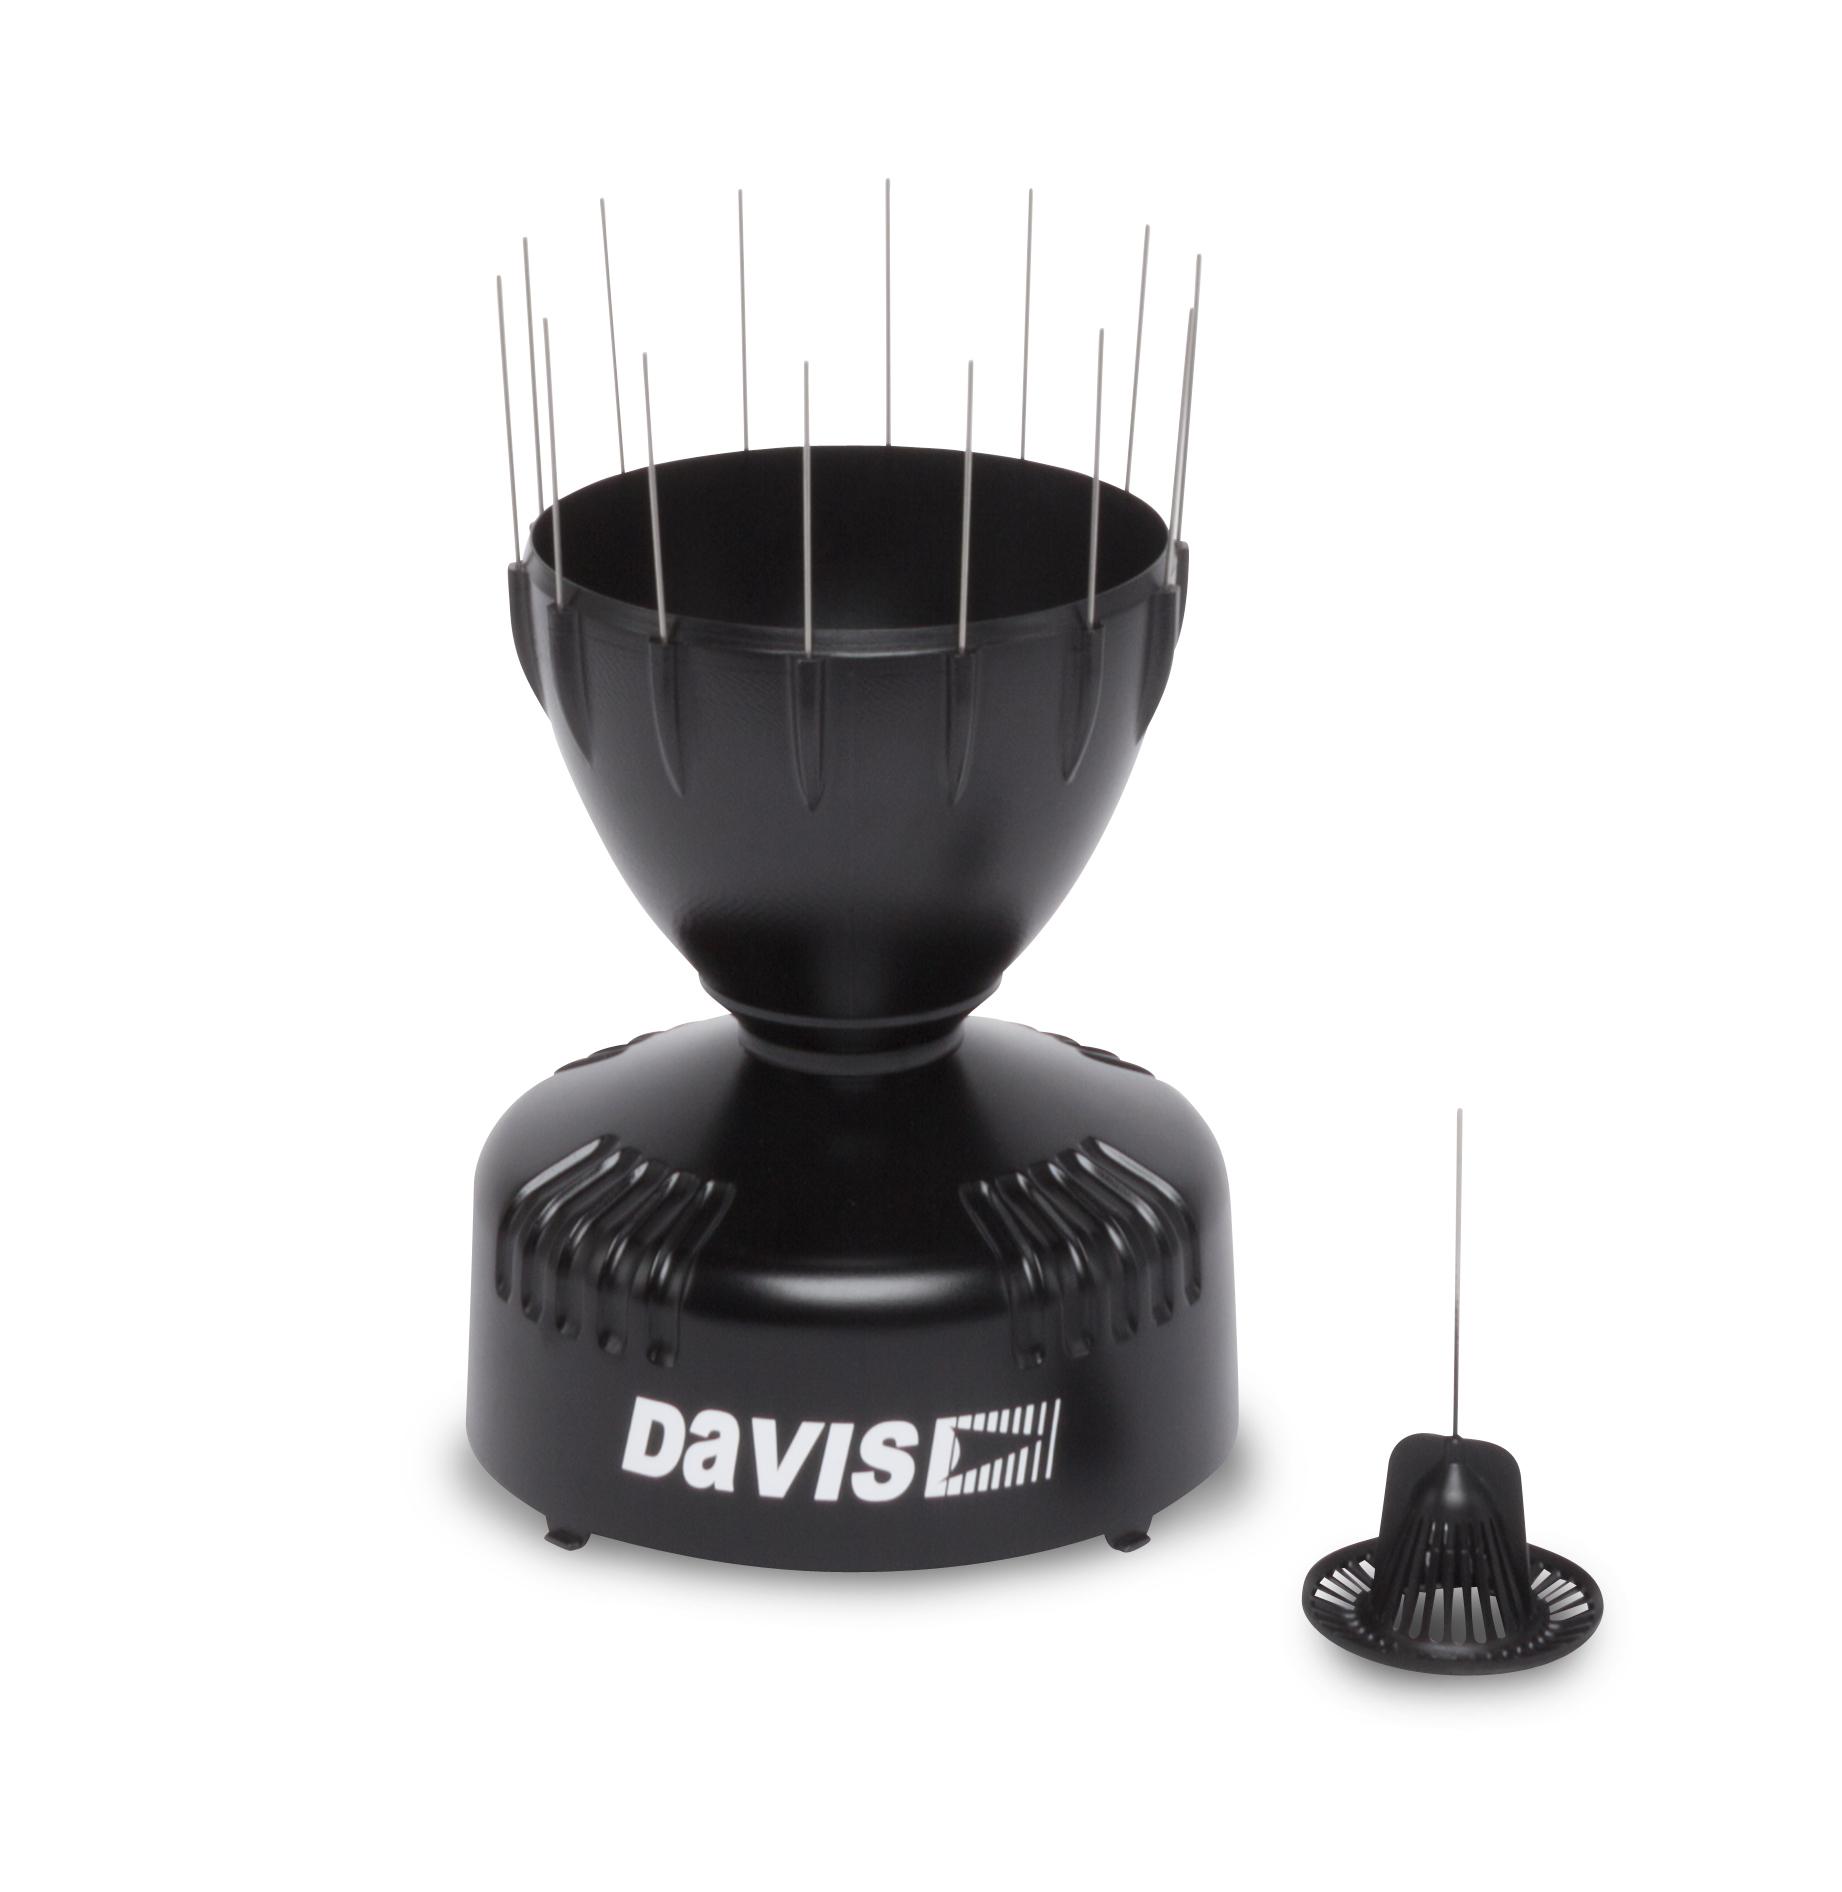 Davis 6162 VP2 Vantage Pro 2 Plus professional weerstation